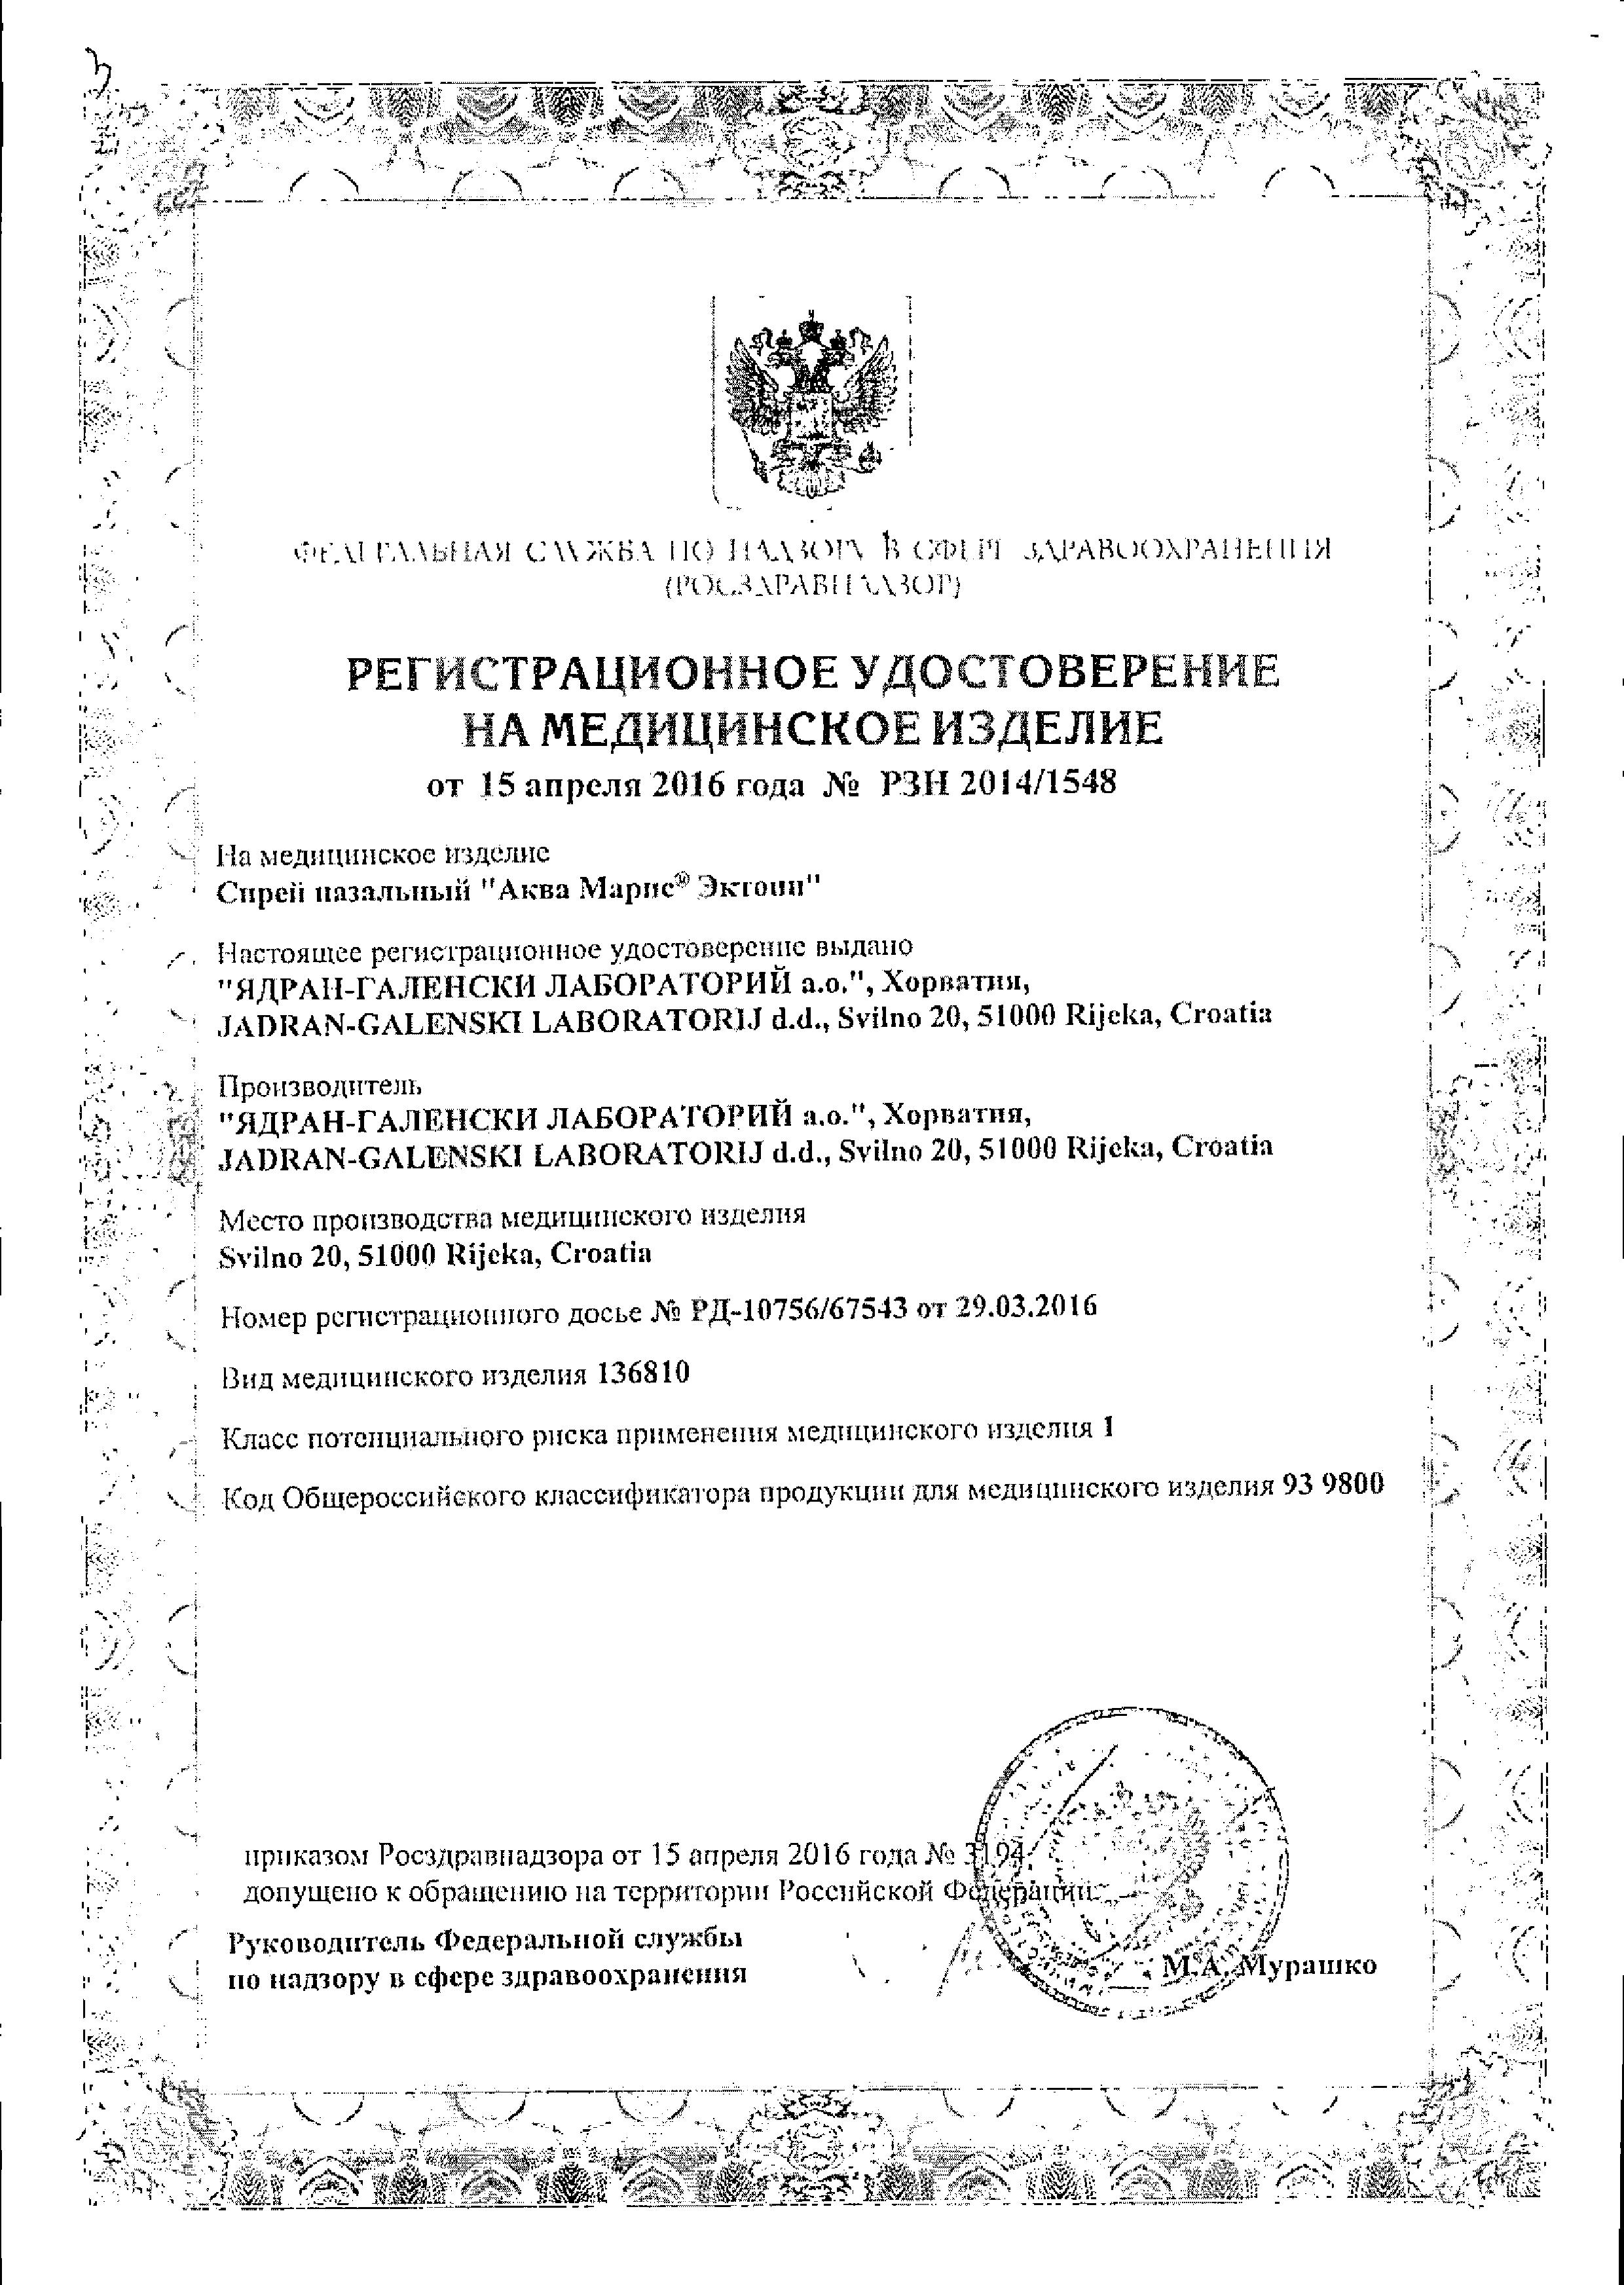 Аква Марис Эктоин сертификат